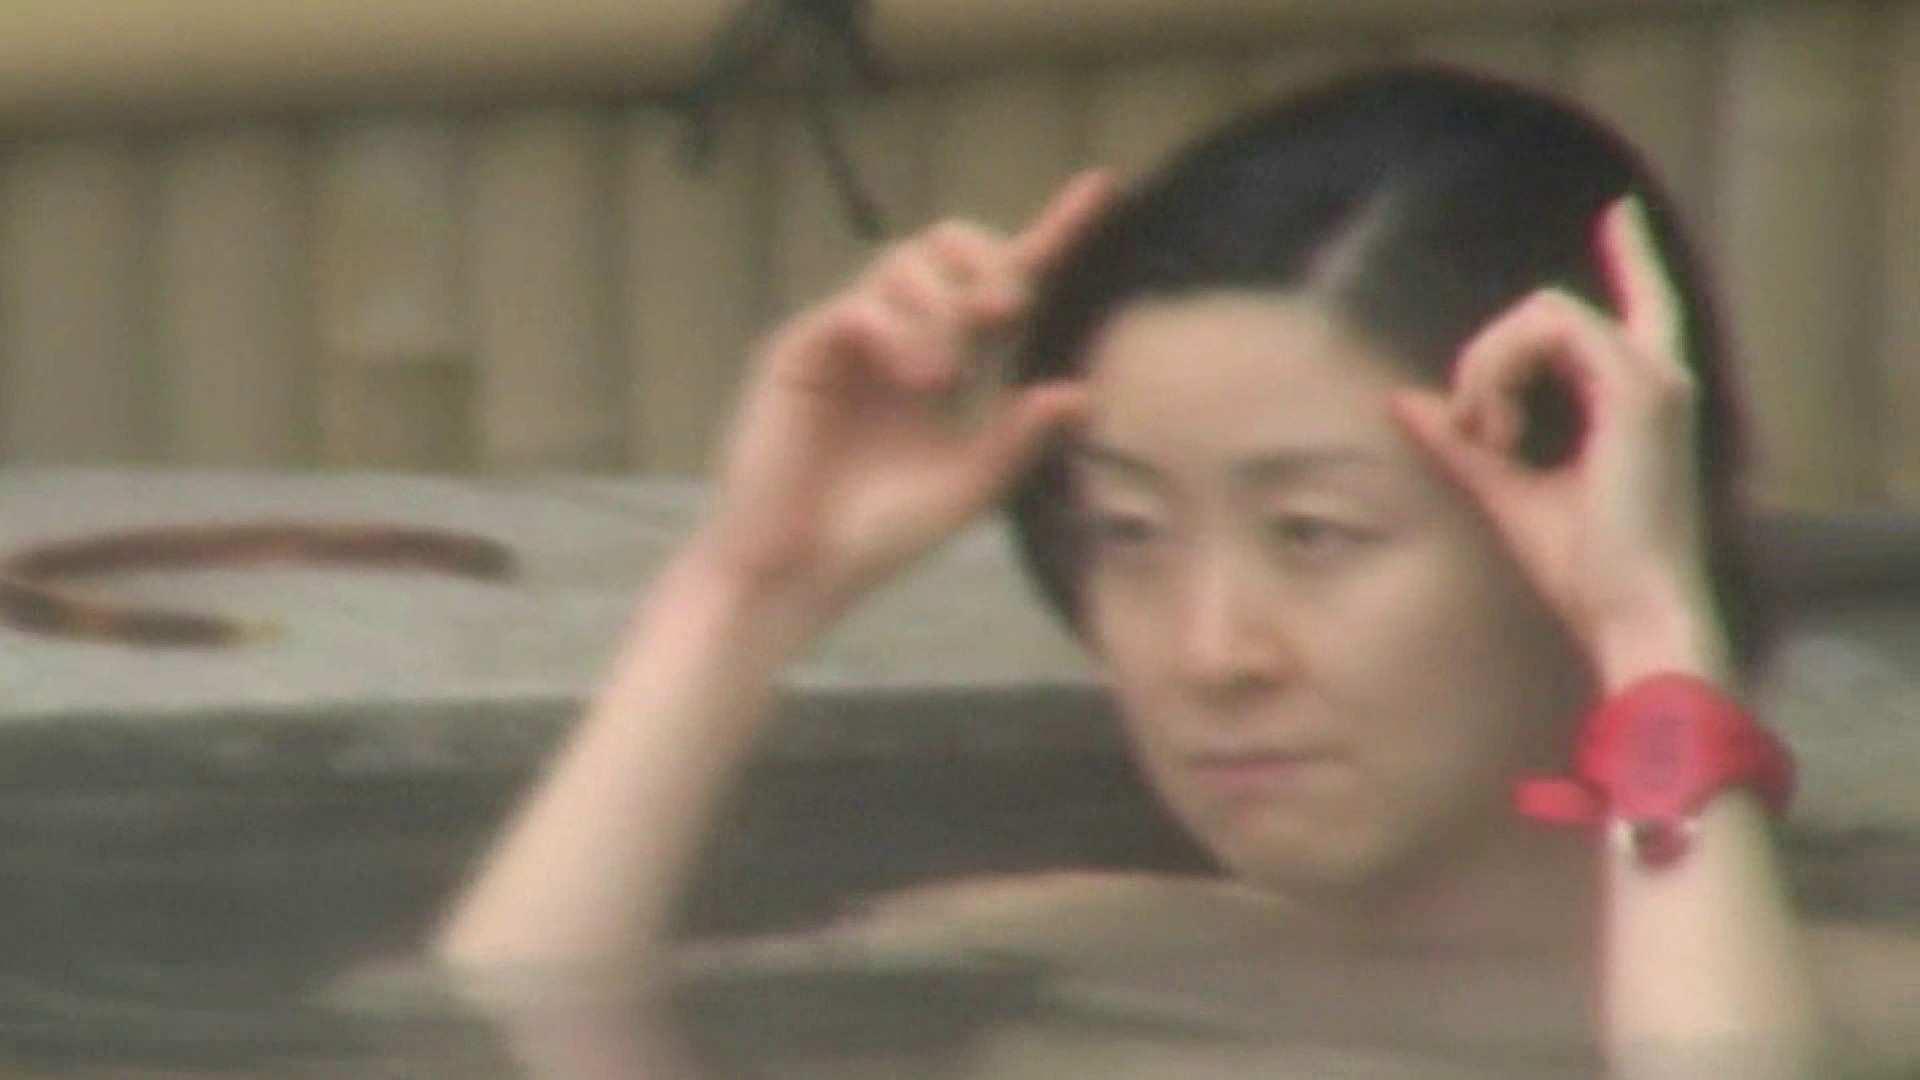 Aquaな露天風呂Vol.548 女体盗撮 | OL女体  70連発 22